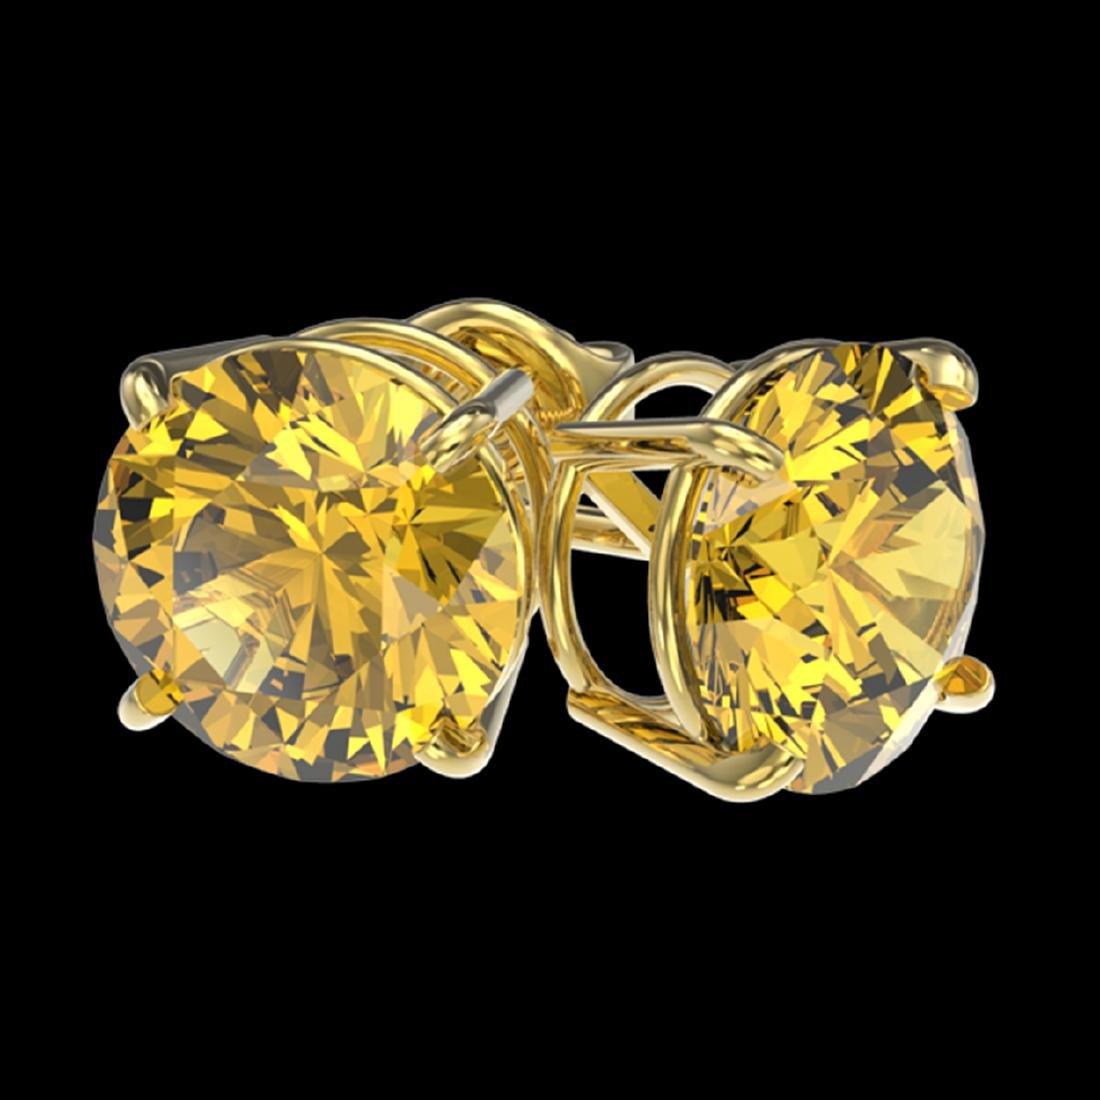 3 ctw Intense Yellow Diamond Stud Earrings 10K Yellow - 3